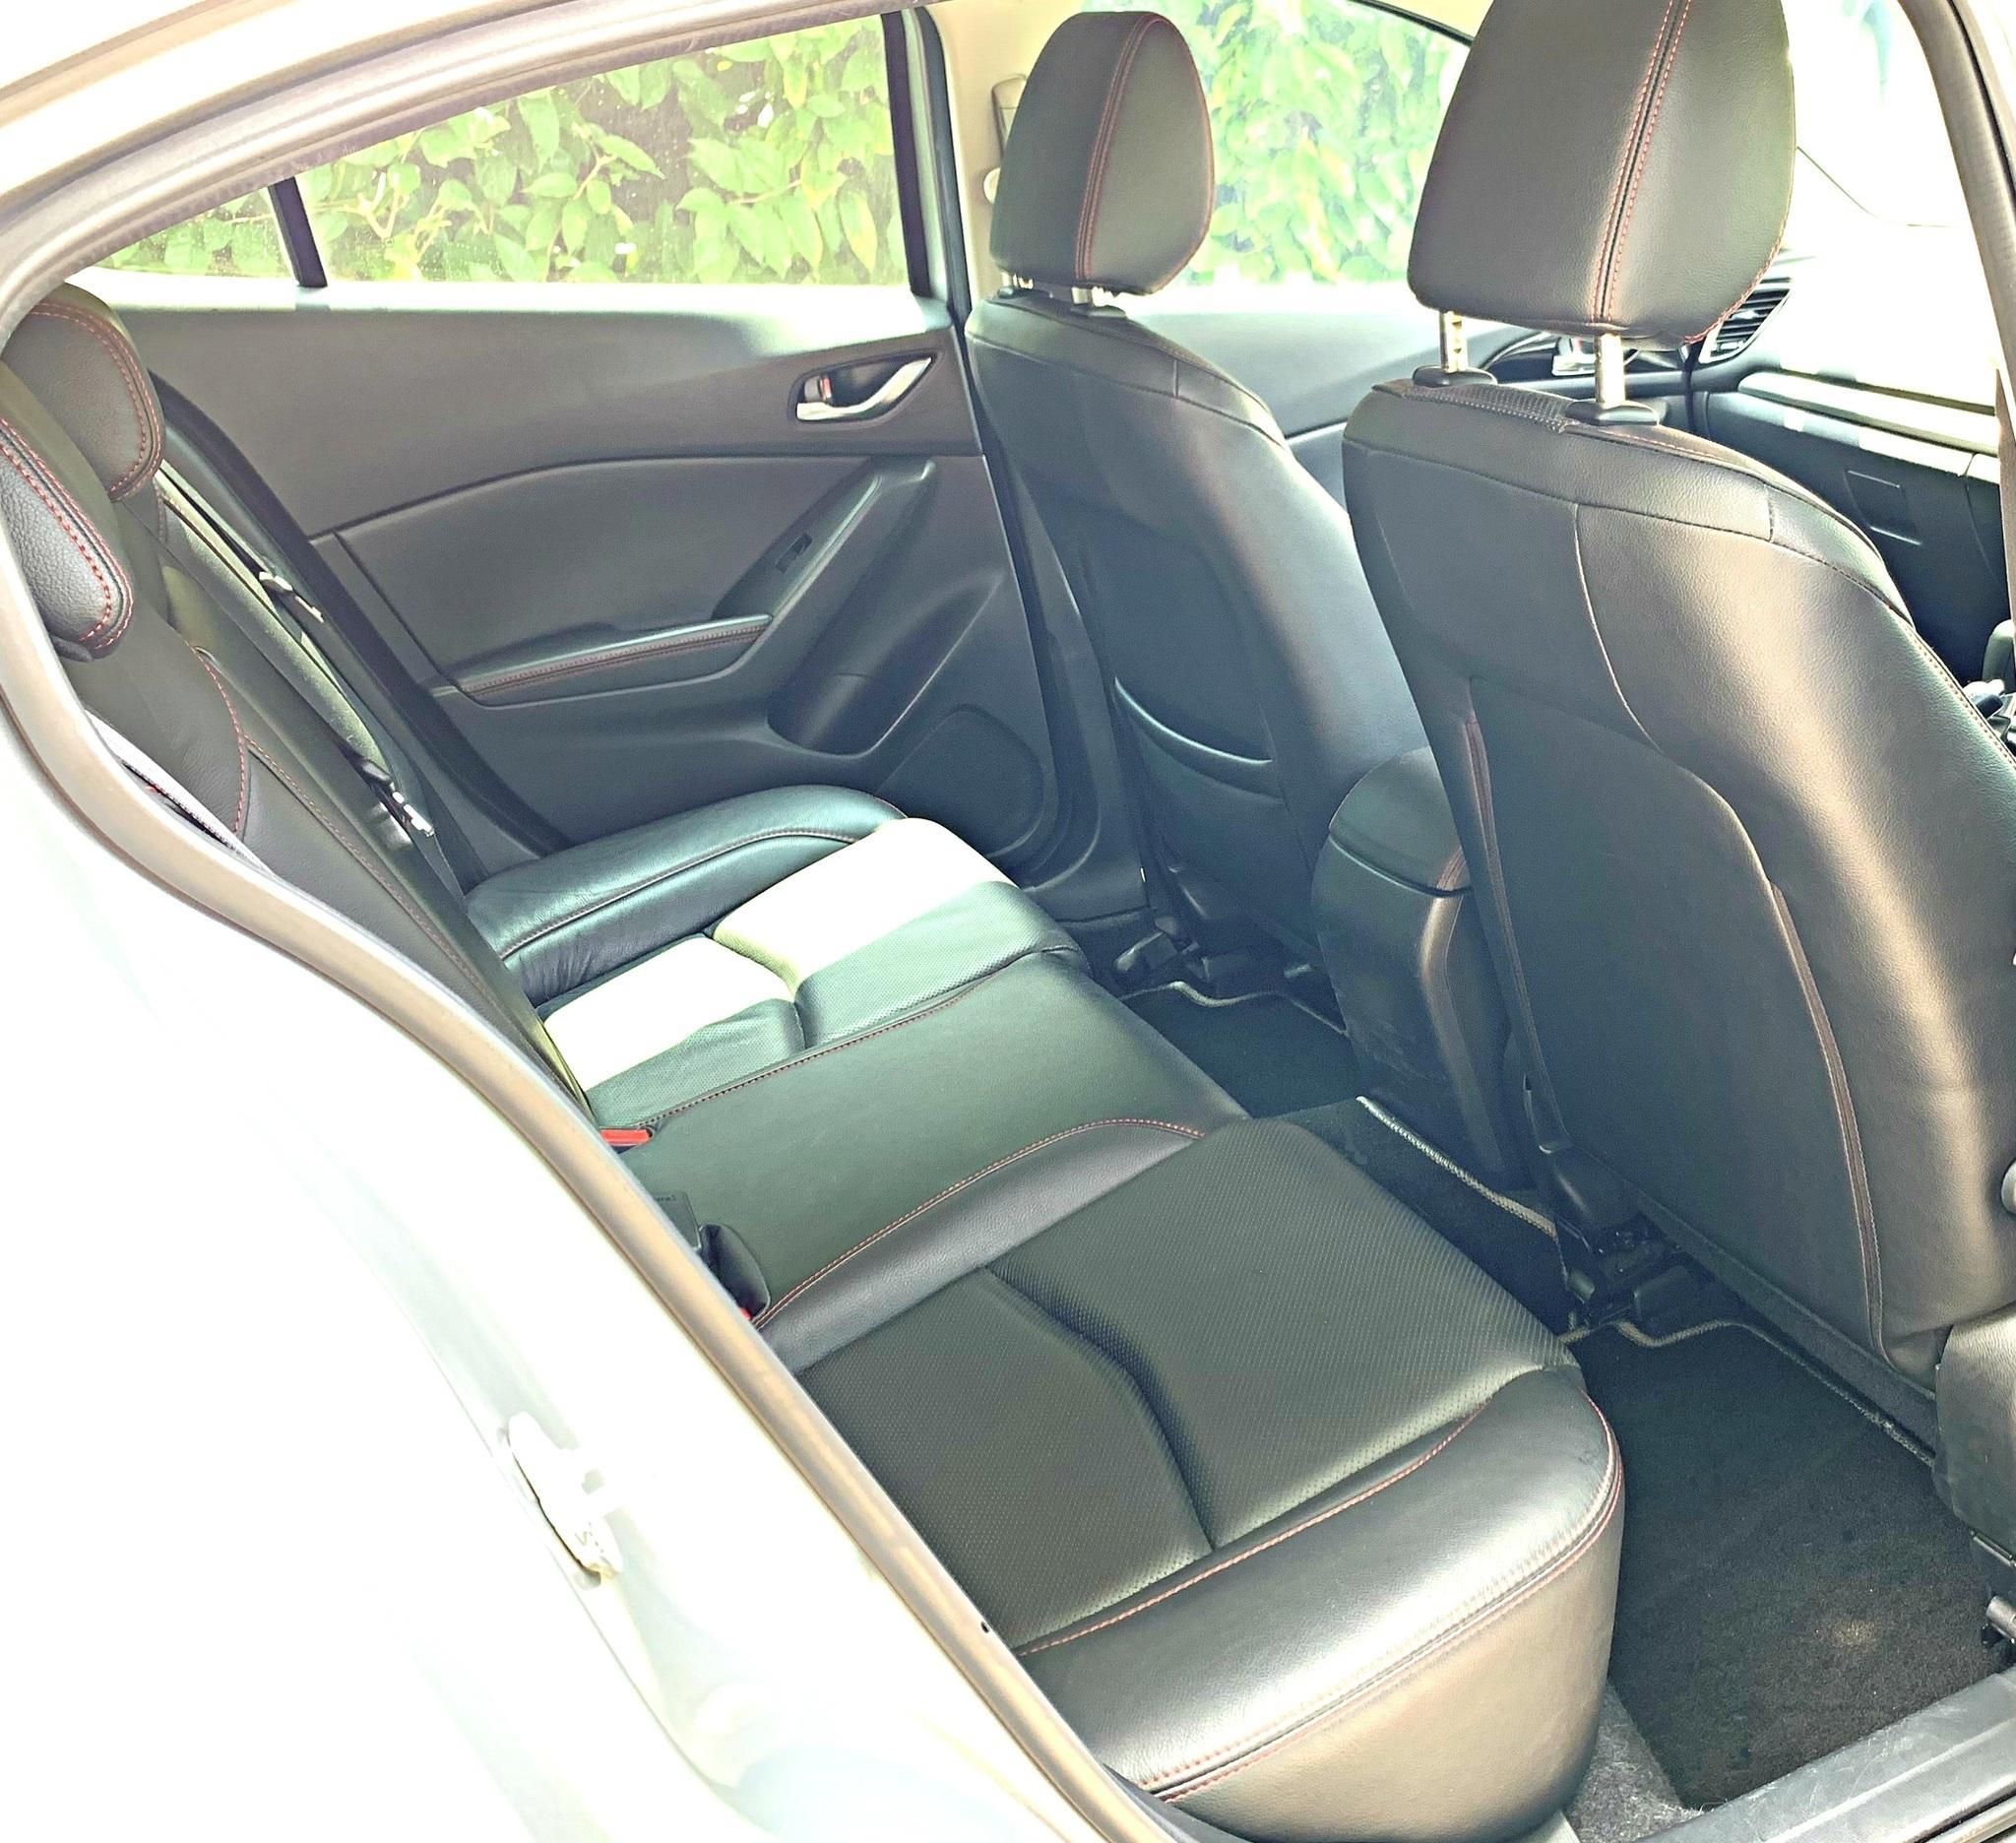 Mazda 3 1.5 Hatchback Standard 6AT Auto